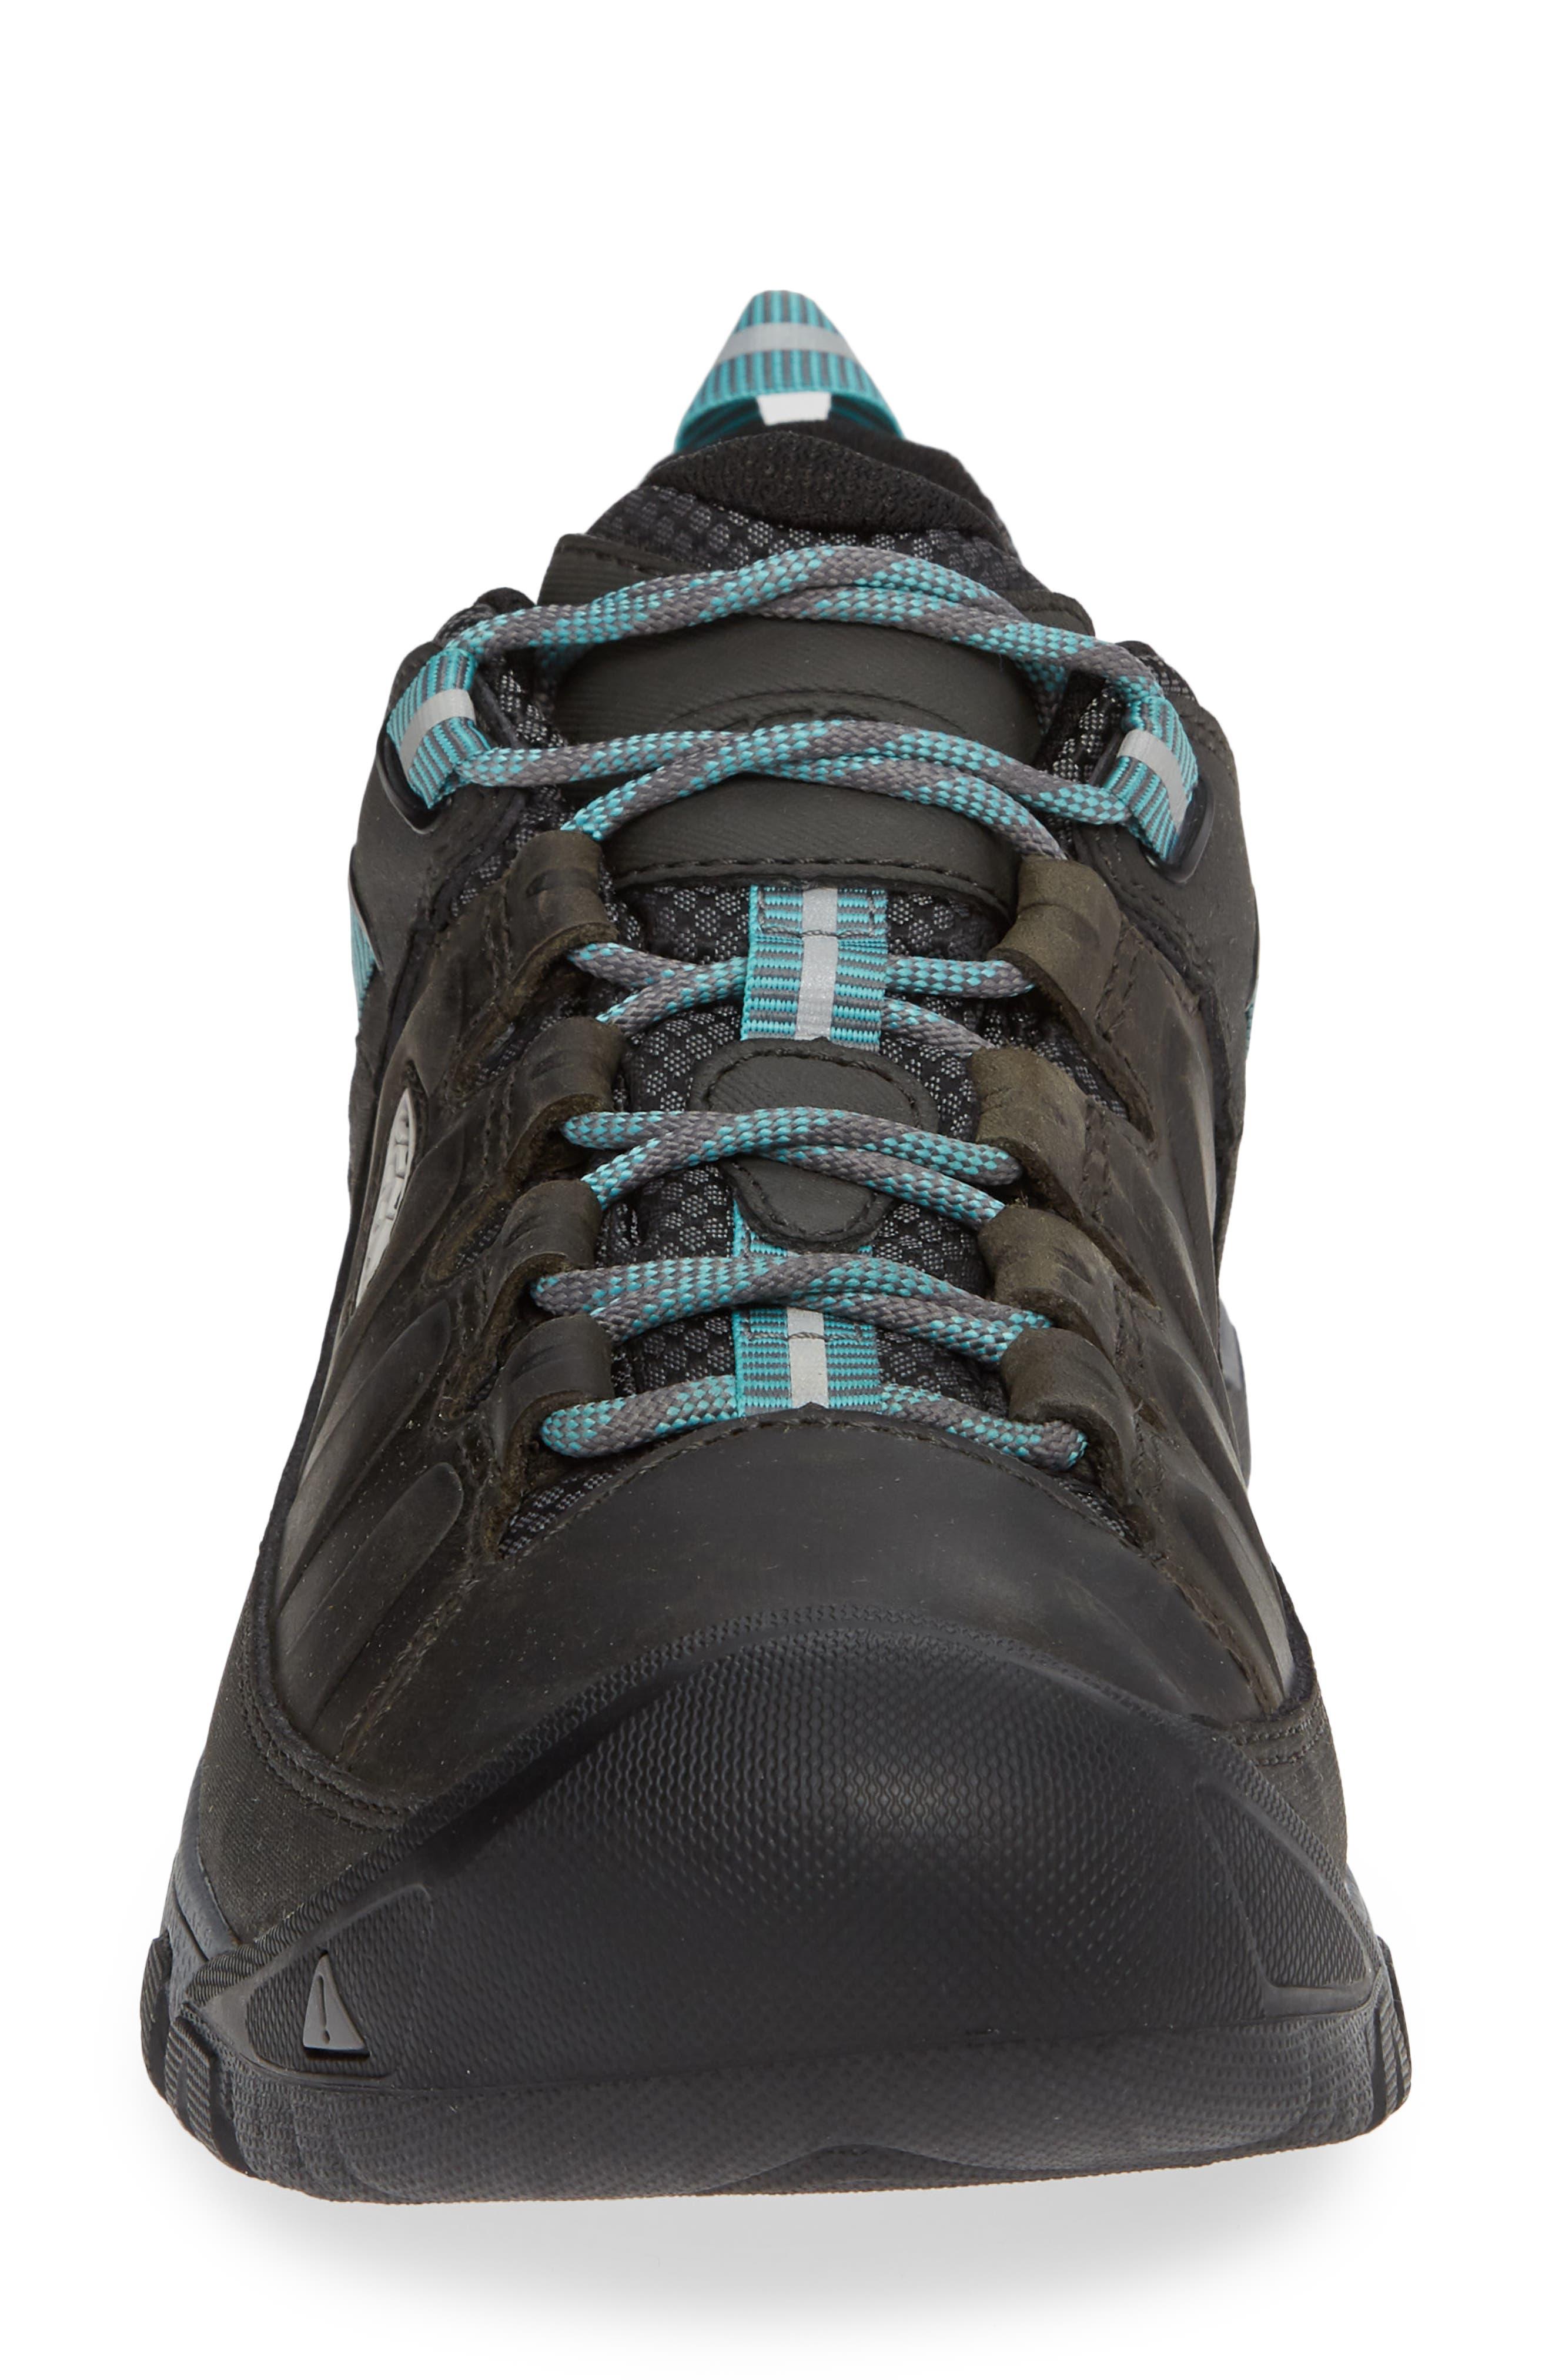 Targhee III Waterproof Hiking Shoe,                             Alternate thumbnail 4, color,                             ALCATRAZ/ TURQUOISE LEATHER